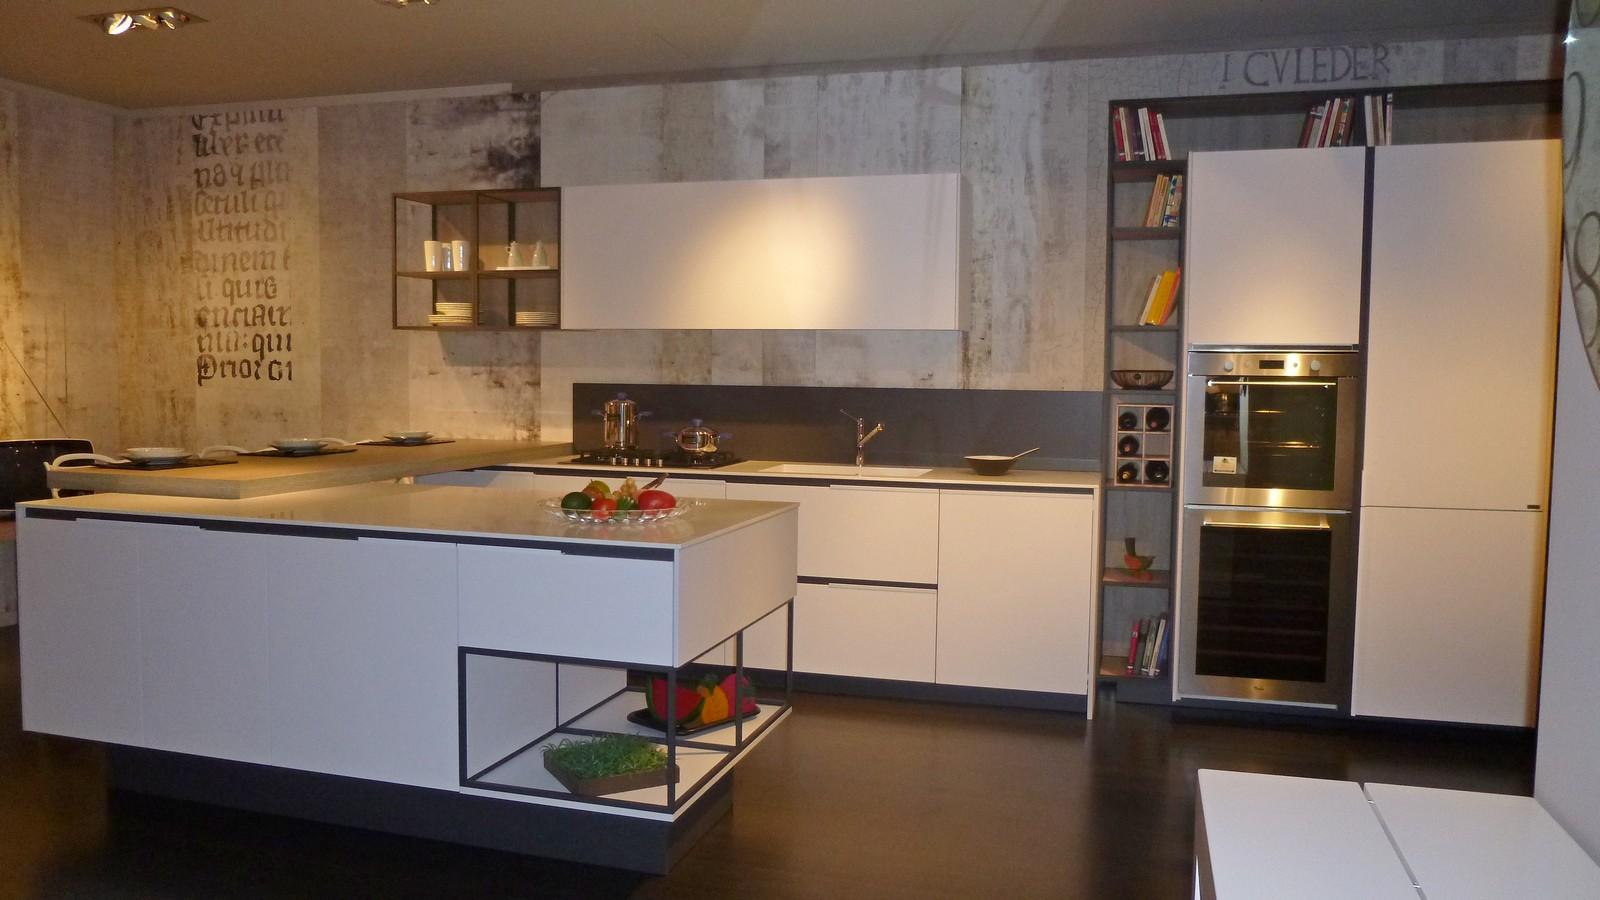 Cucine Moderne Ad Angolo Con Isola. Cucine Gallery Of Cucina Isola ...